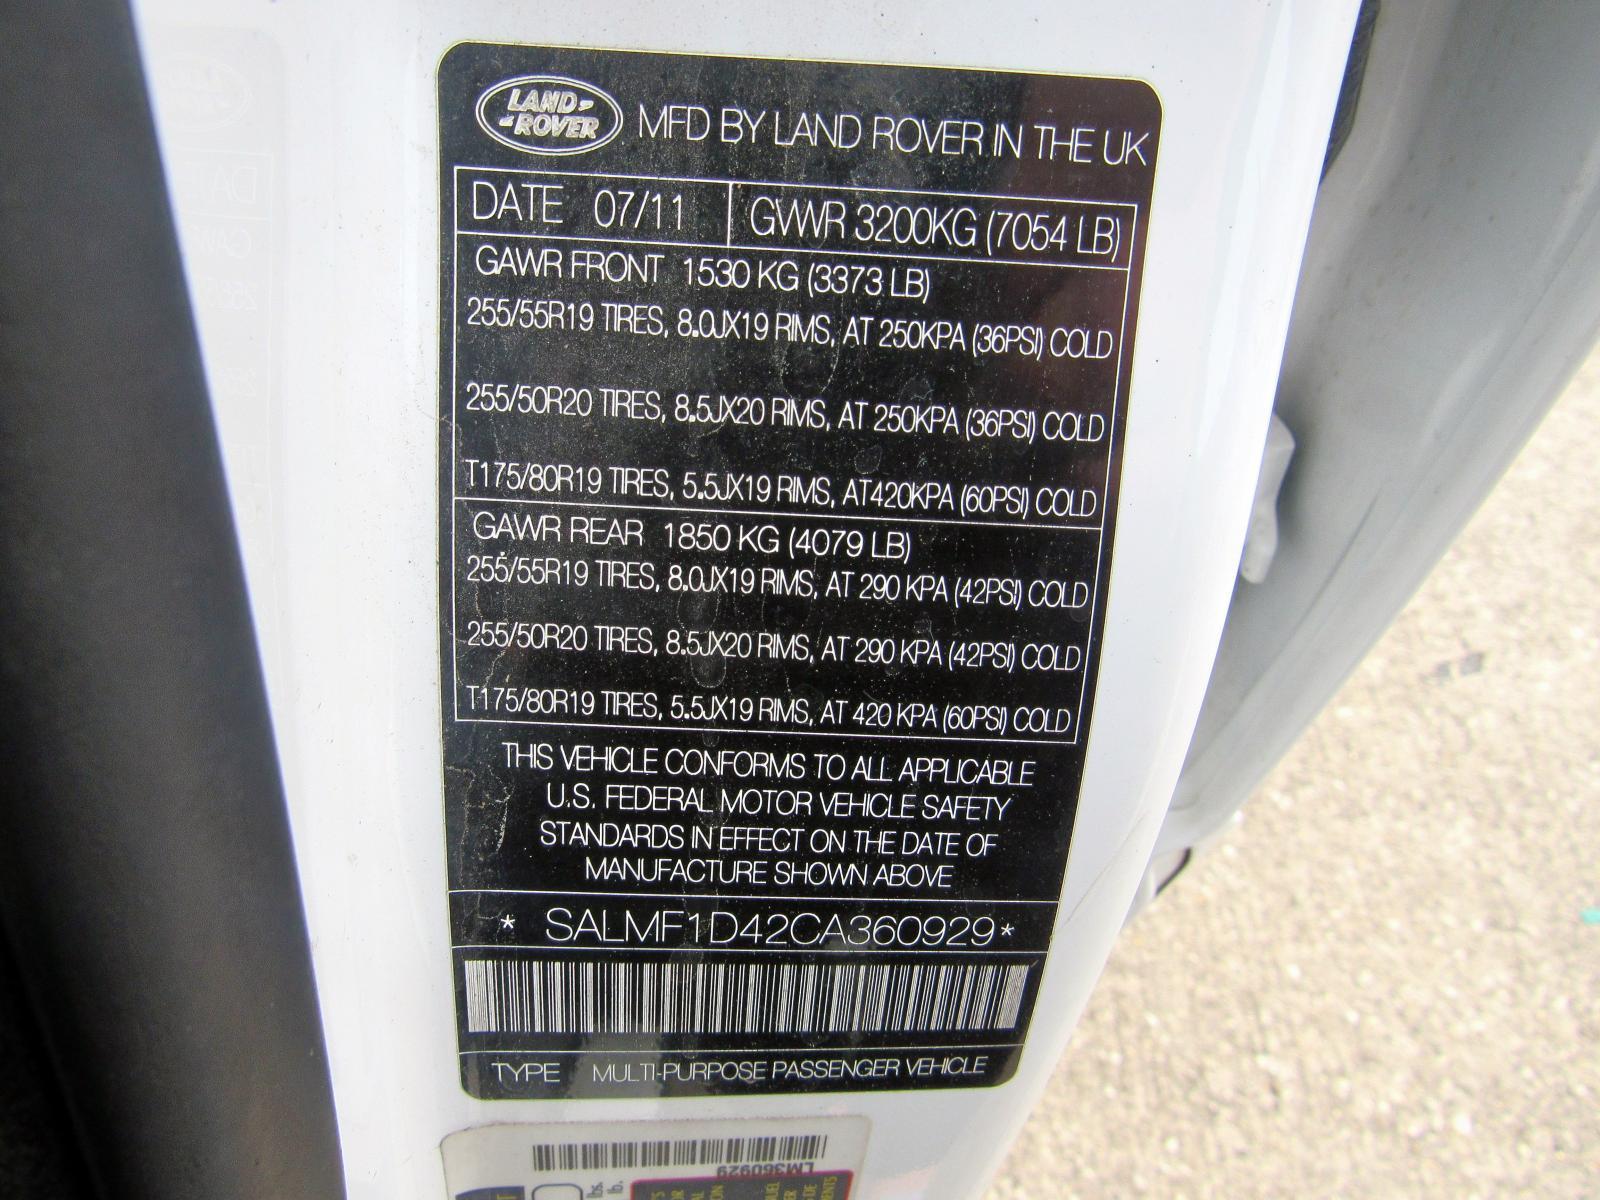 SALMF1D42CA360929 - 2012 Land Rover Range Rove 5.0L